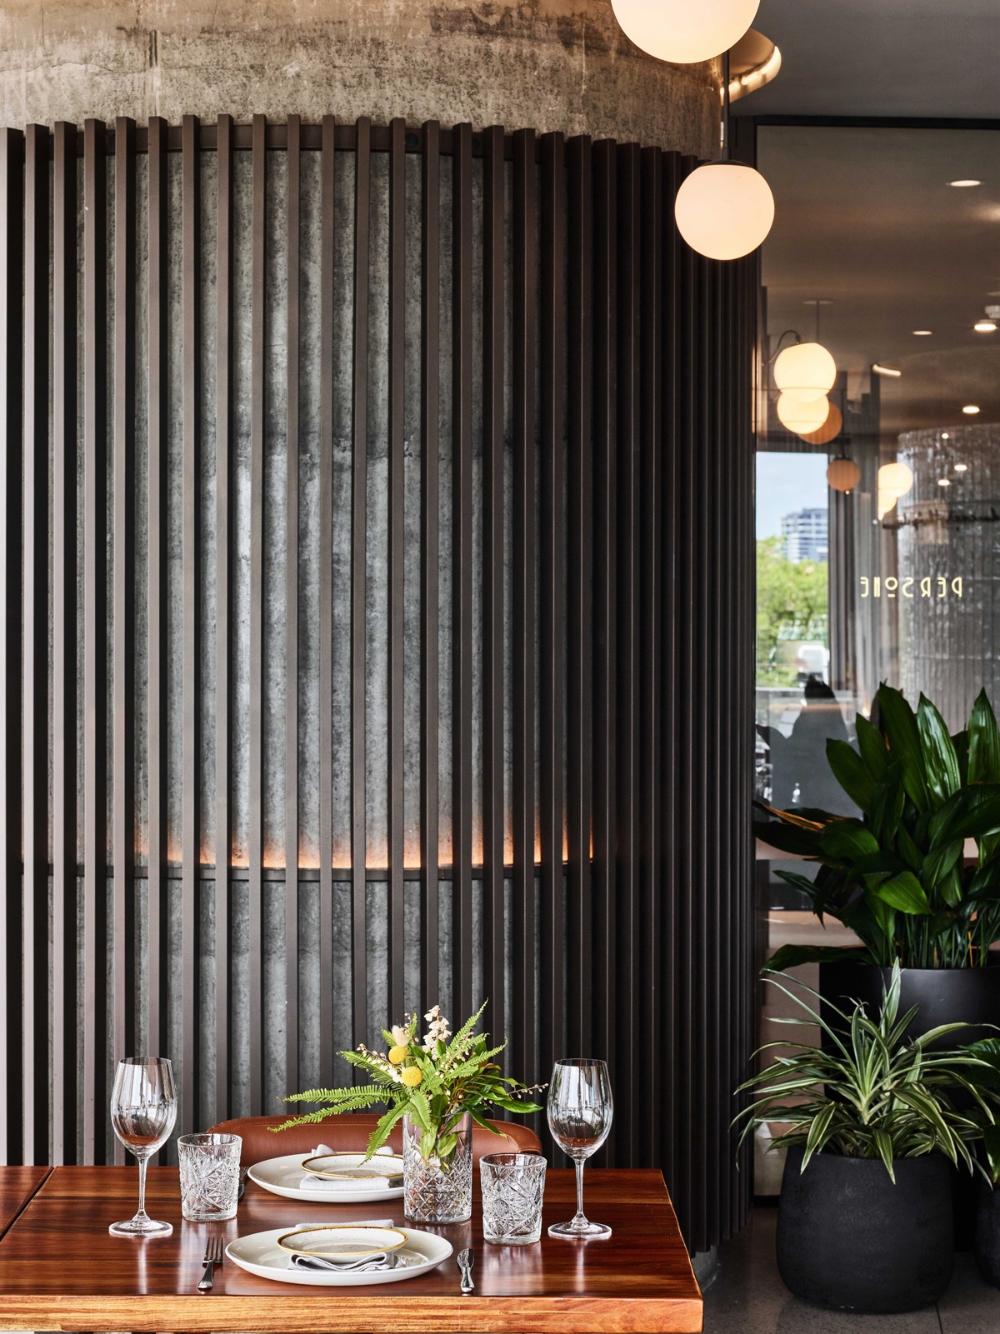 Plus Architecture Designs Chic Interior For Persone Restaurant In